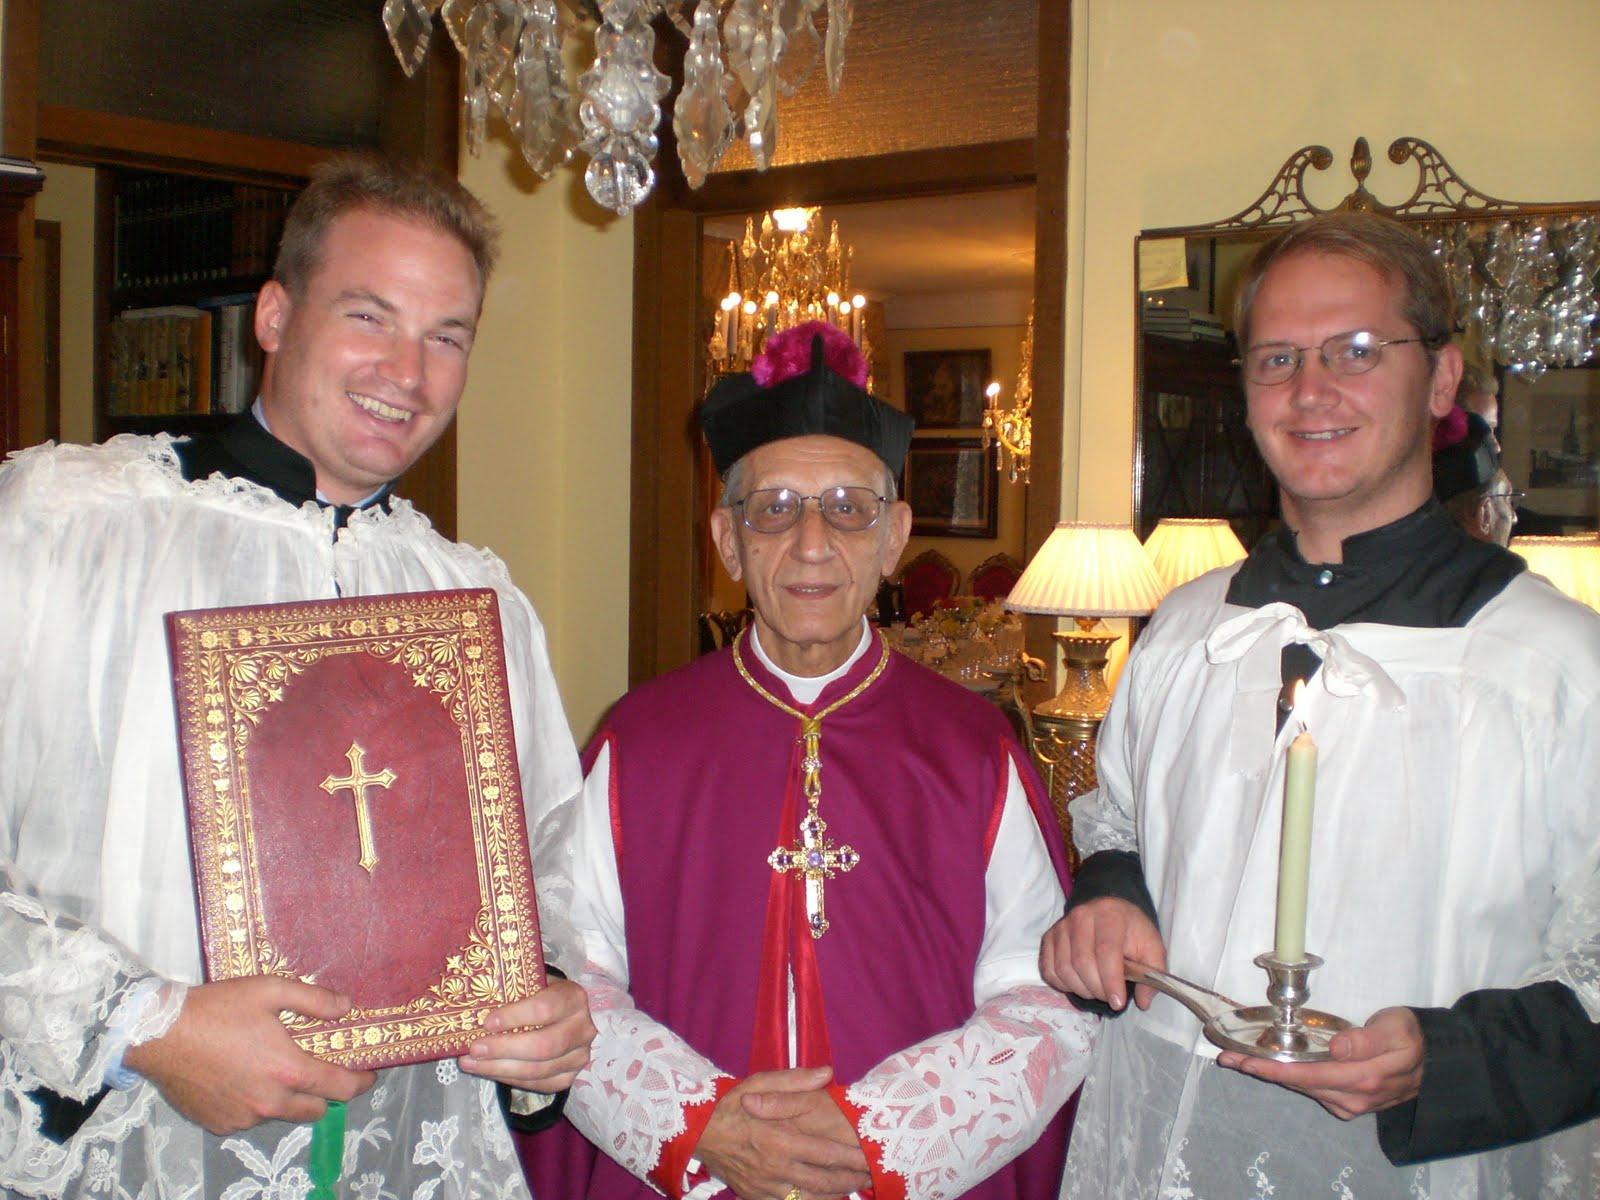 Kardinaal Danneels News: Messainlatino.it: La Morte Di Mons. Angelo Amodeo